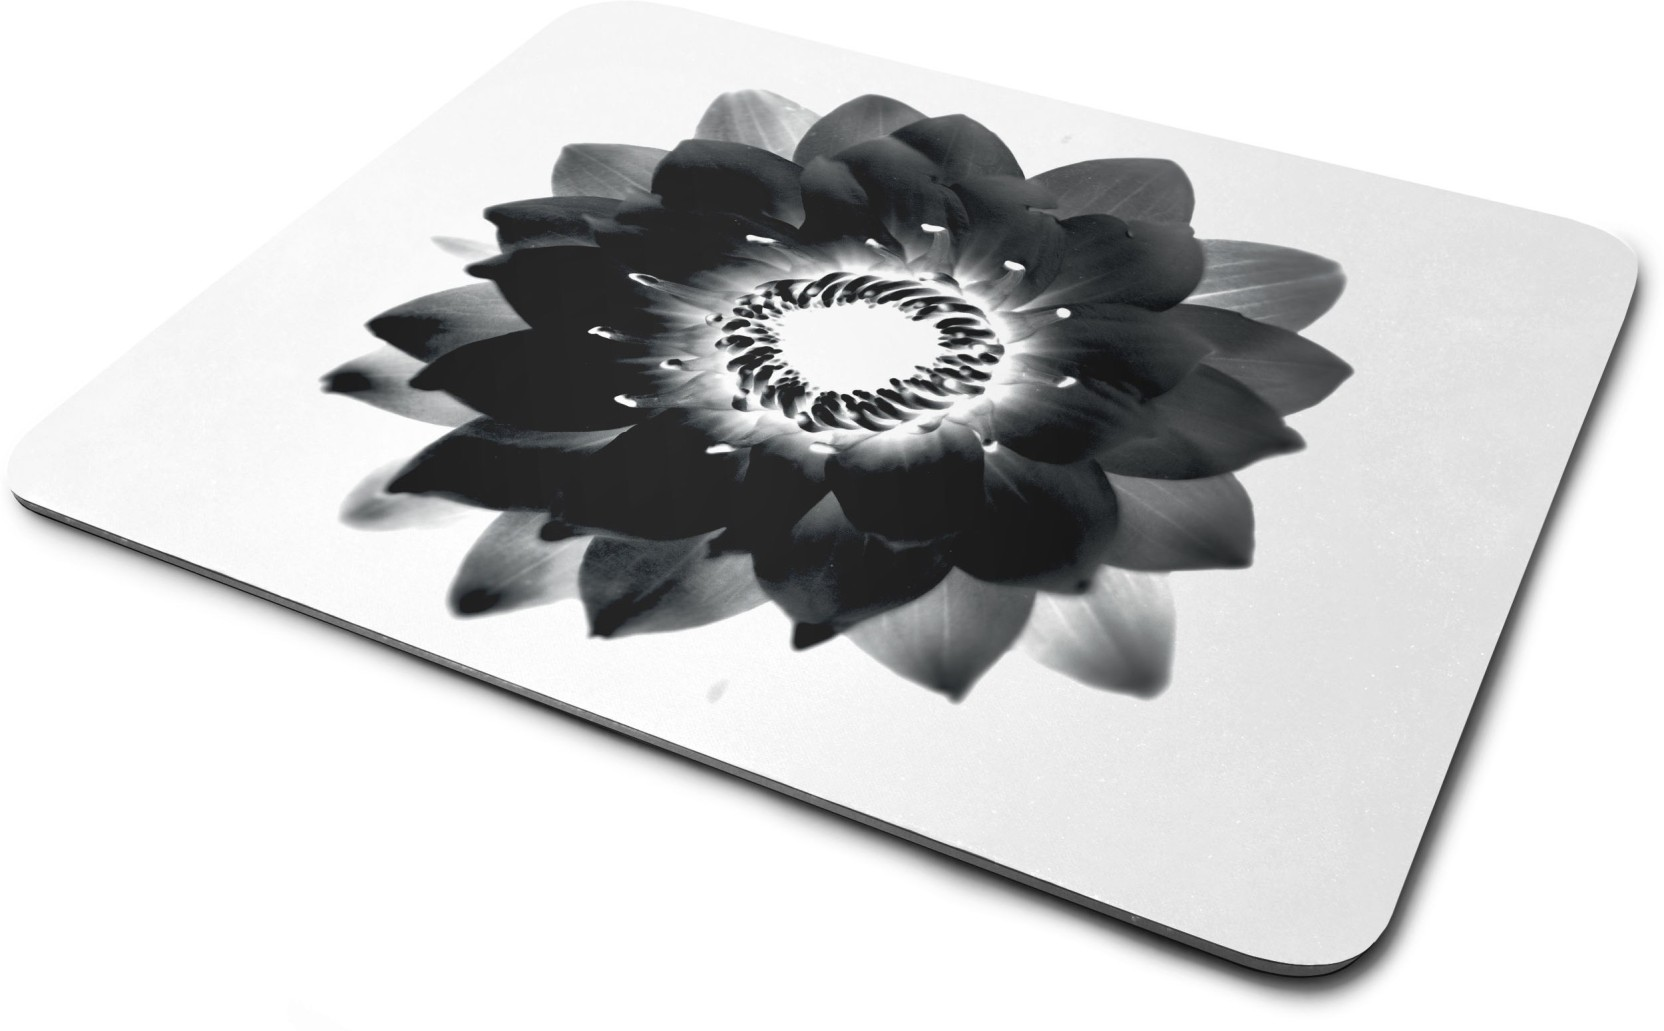 Rawpockets Black Lotus Flower Printed Mouse Padprinted Mouse Pad